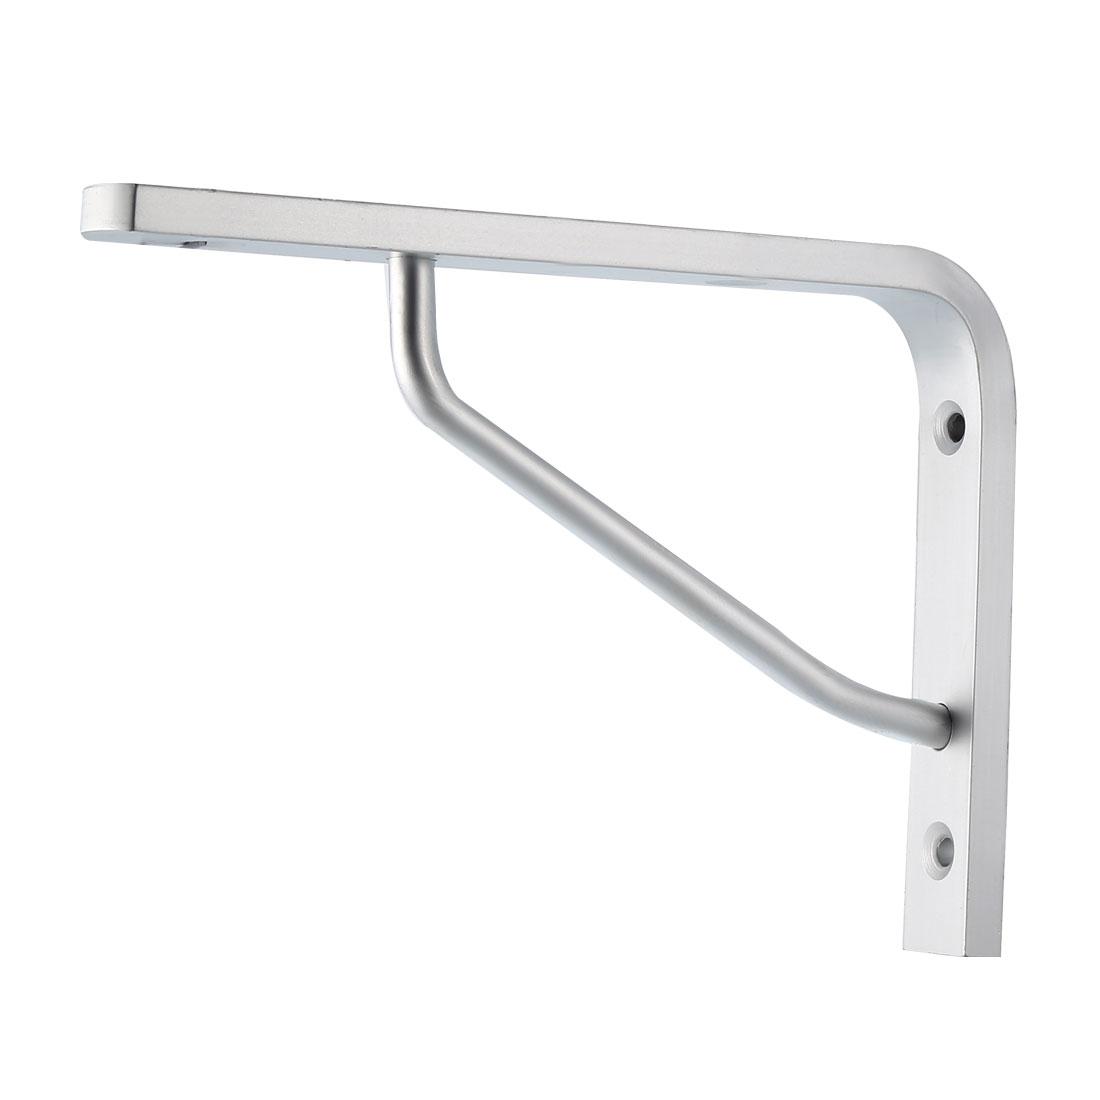 "Shelf Bracket, 7""L x 5""H x 0.4""T Right Angle Bracket Aluminum Alloy 2pcs"